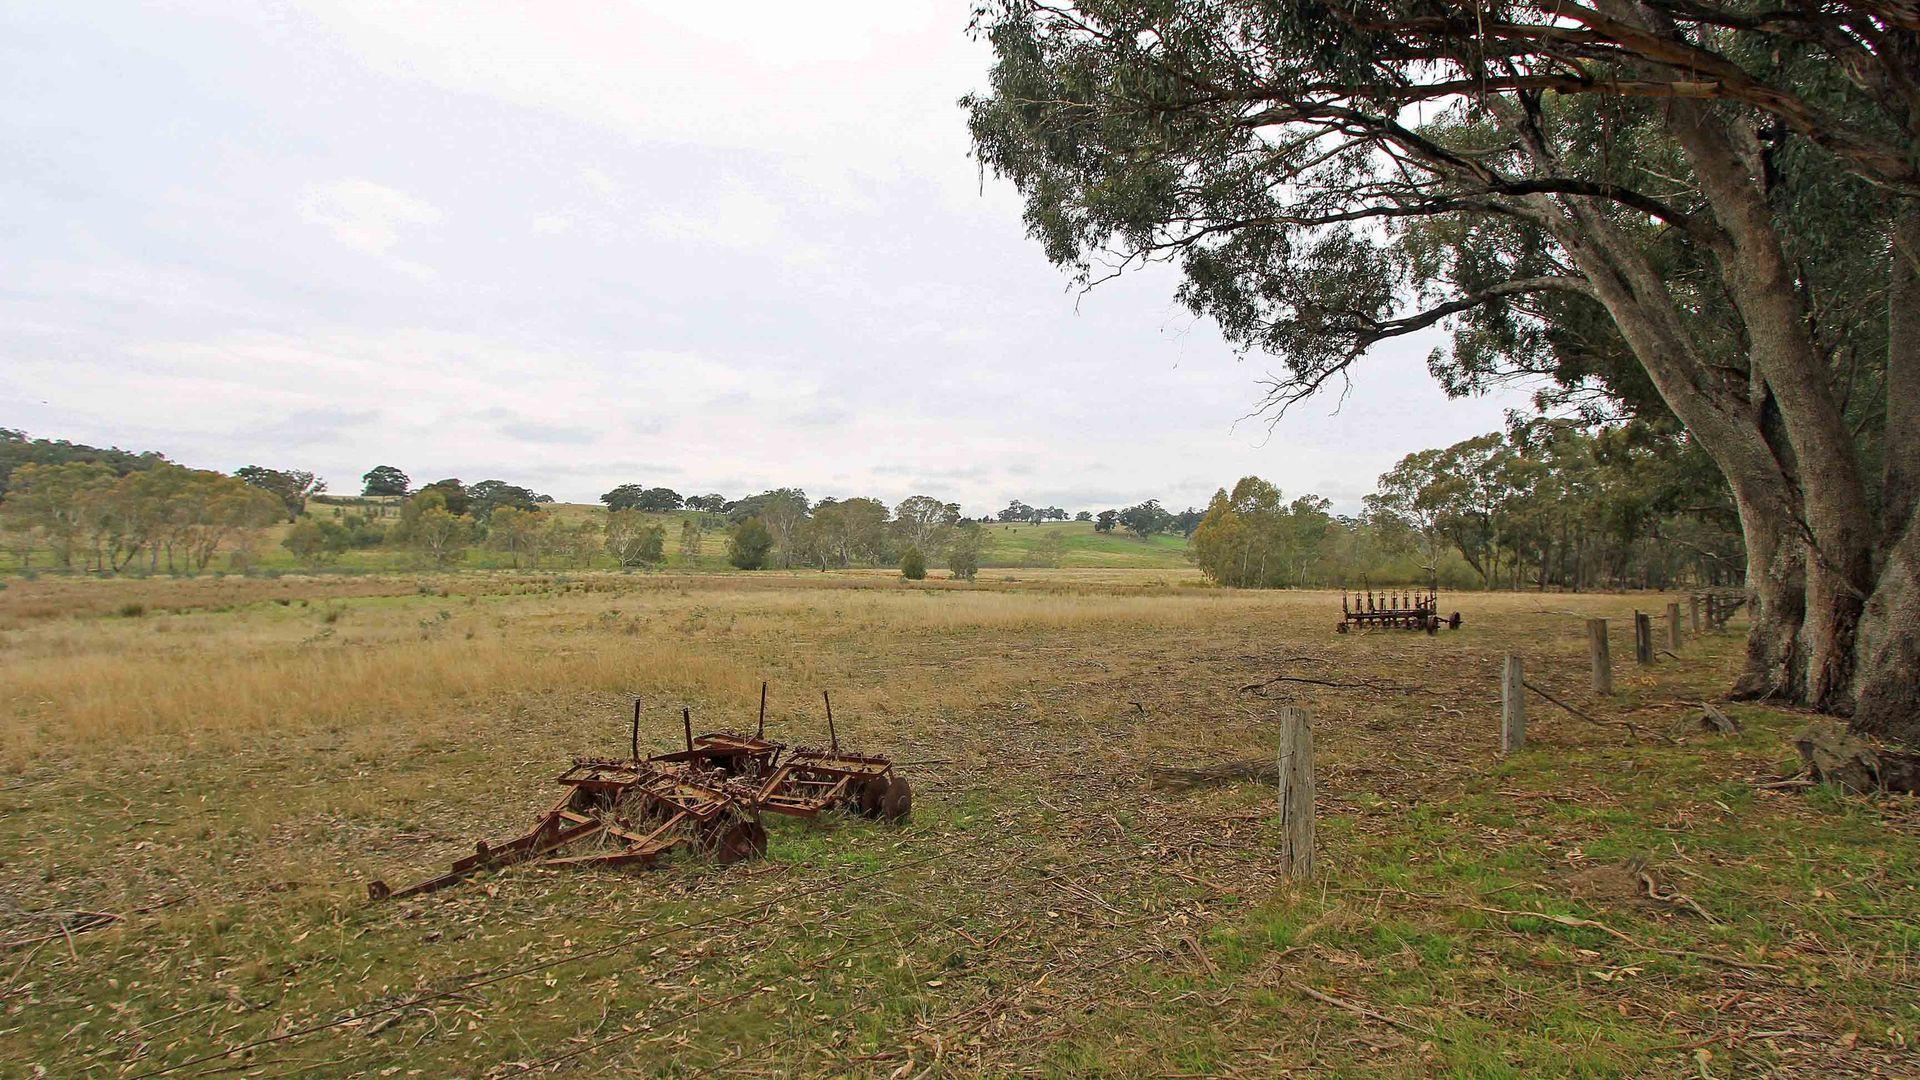 Cnr Spring Plains & Heathcote Redesdale Rd, Heathcote VIC 3523, Image 2